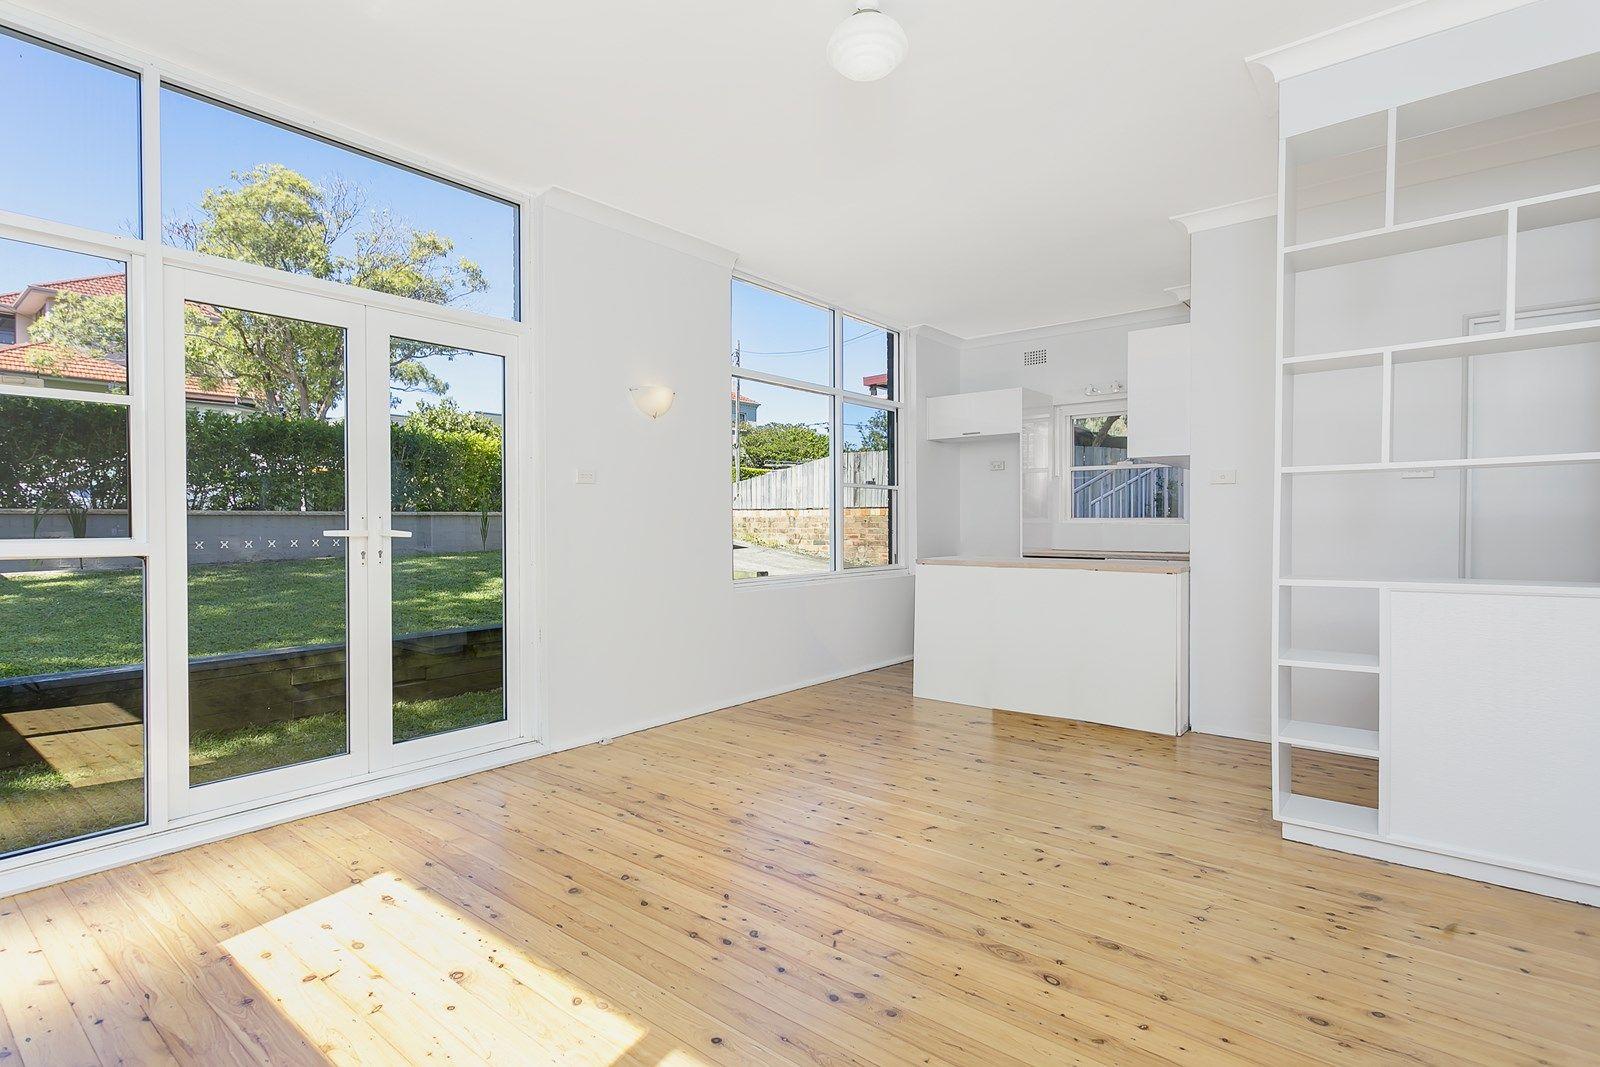 1/42 Upper Beach Street, Balgowlah NSW 2093, Image 1